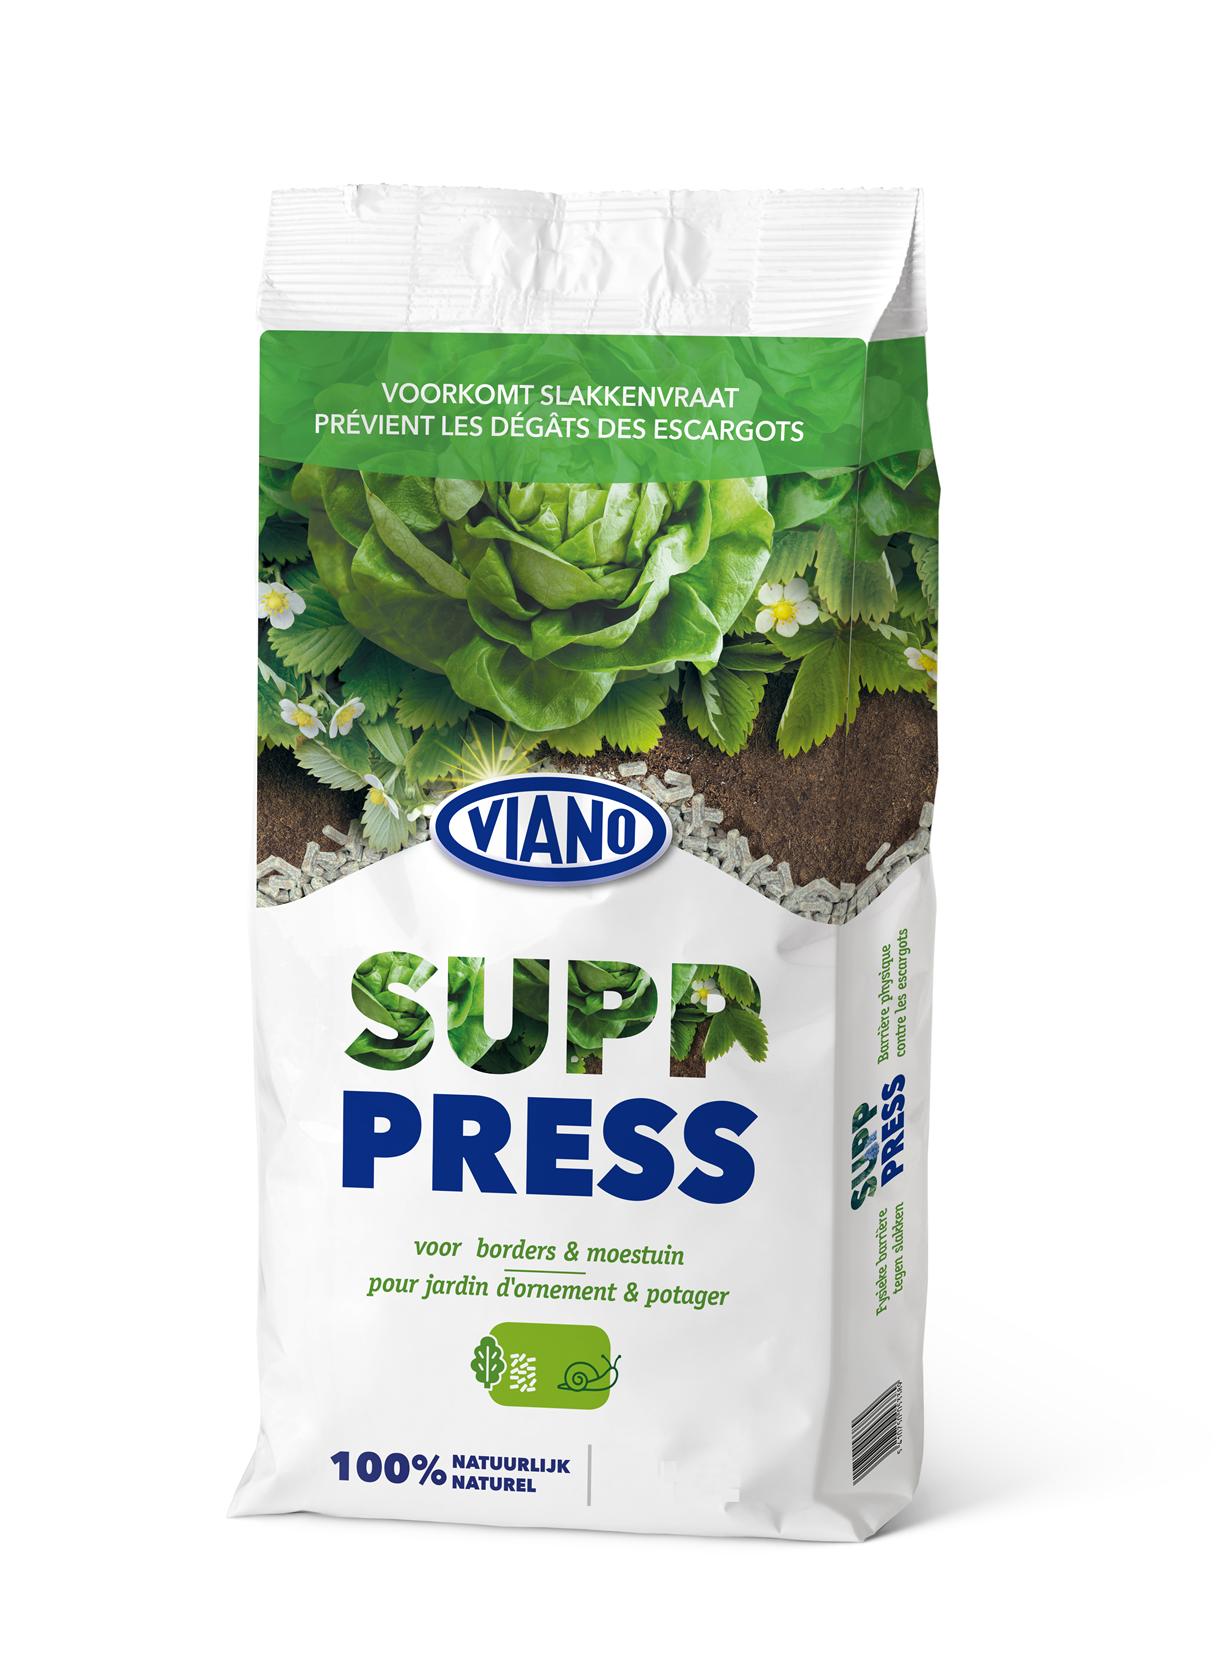 SUP-Press-slakkenvraat-voorkomt-slakkenvraat-65L